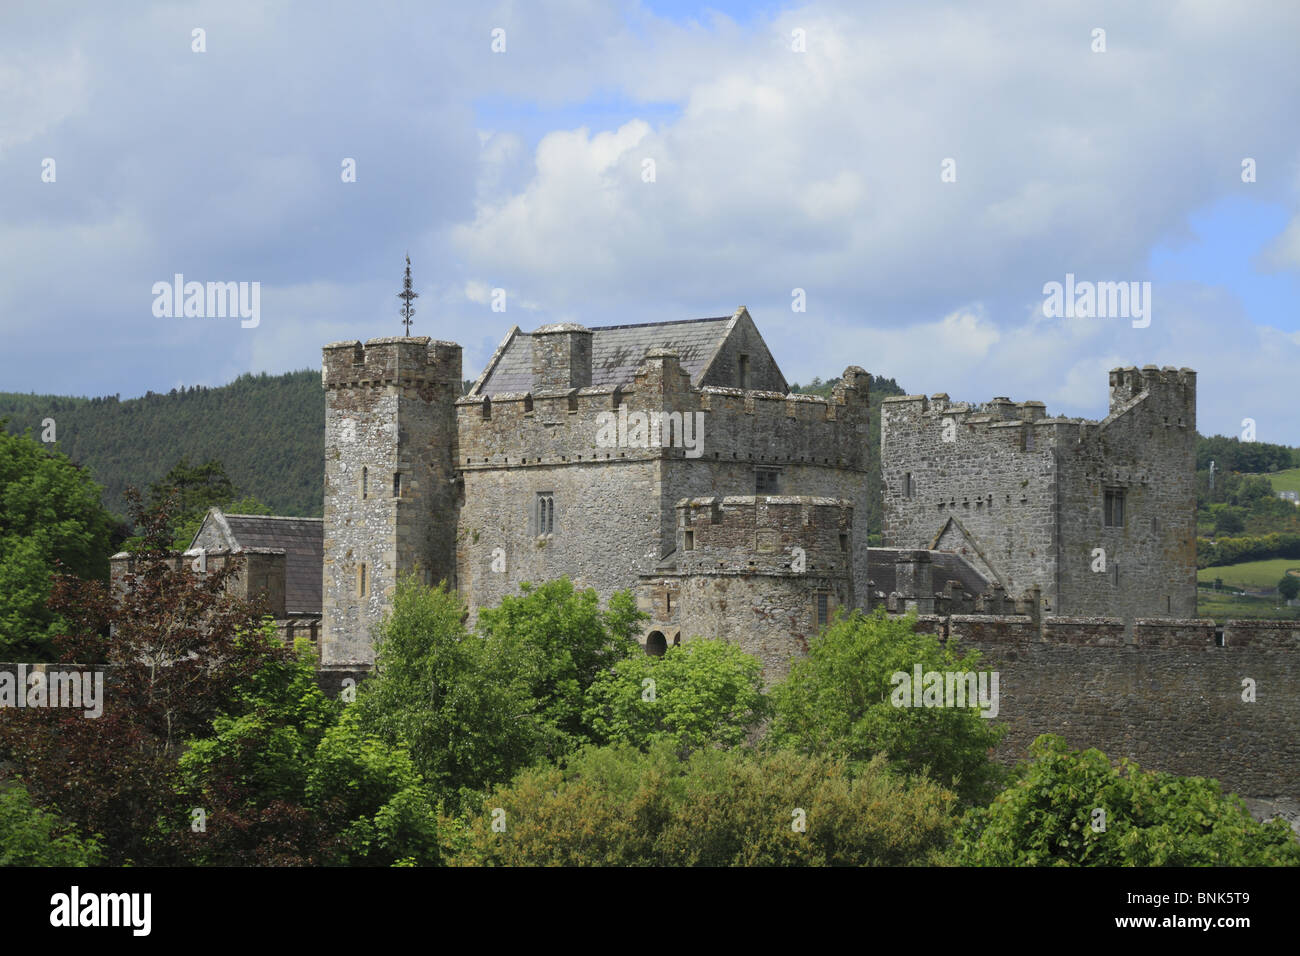 Cahir Castle - Wikipedia